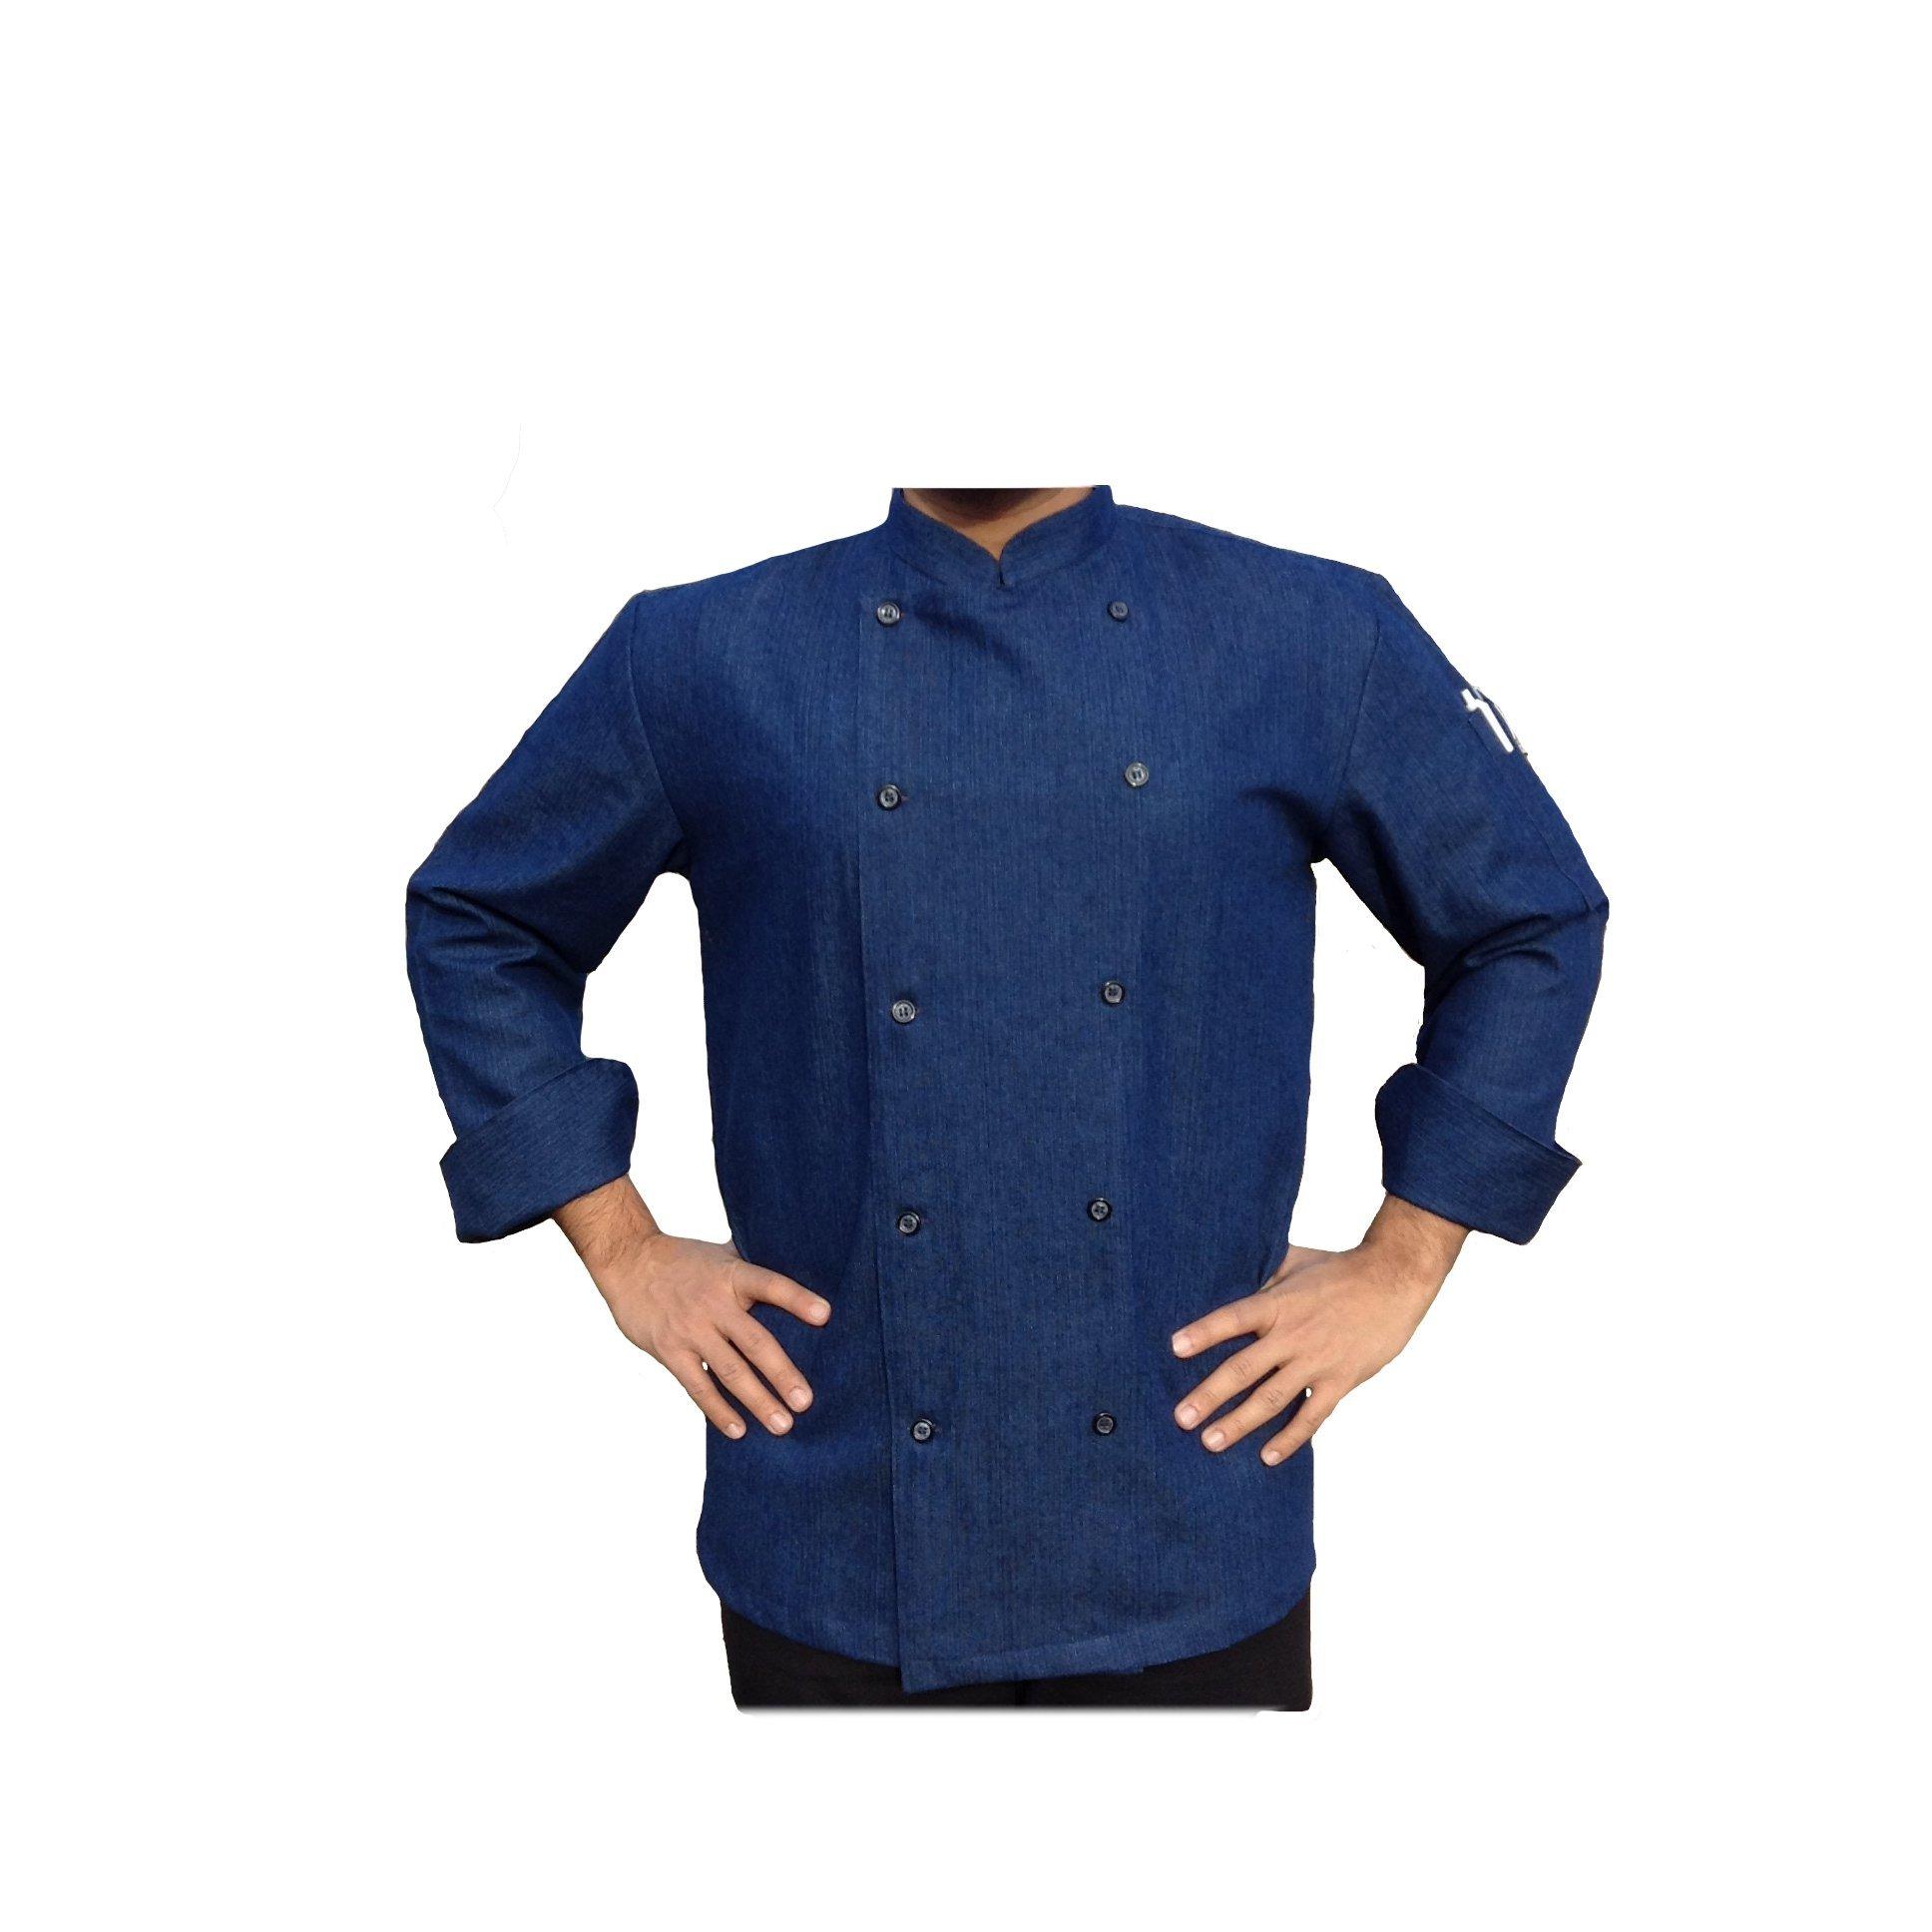 Premium Chef coats by Chef's Satchel